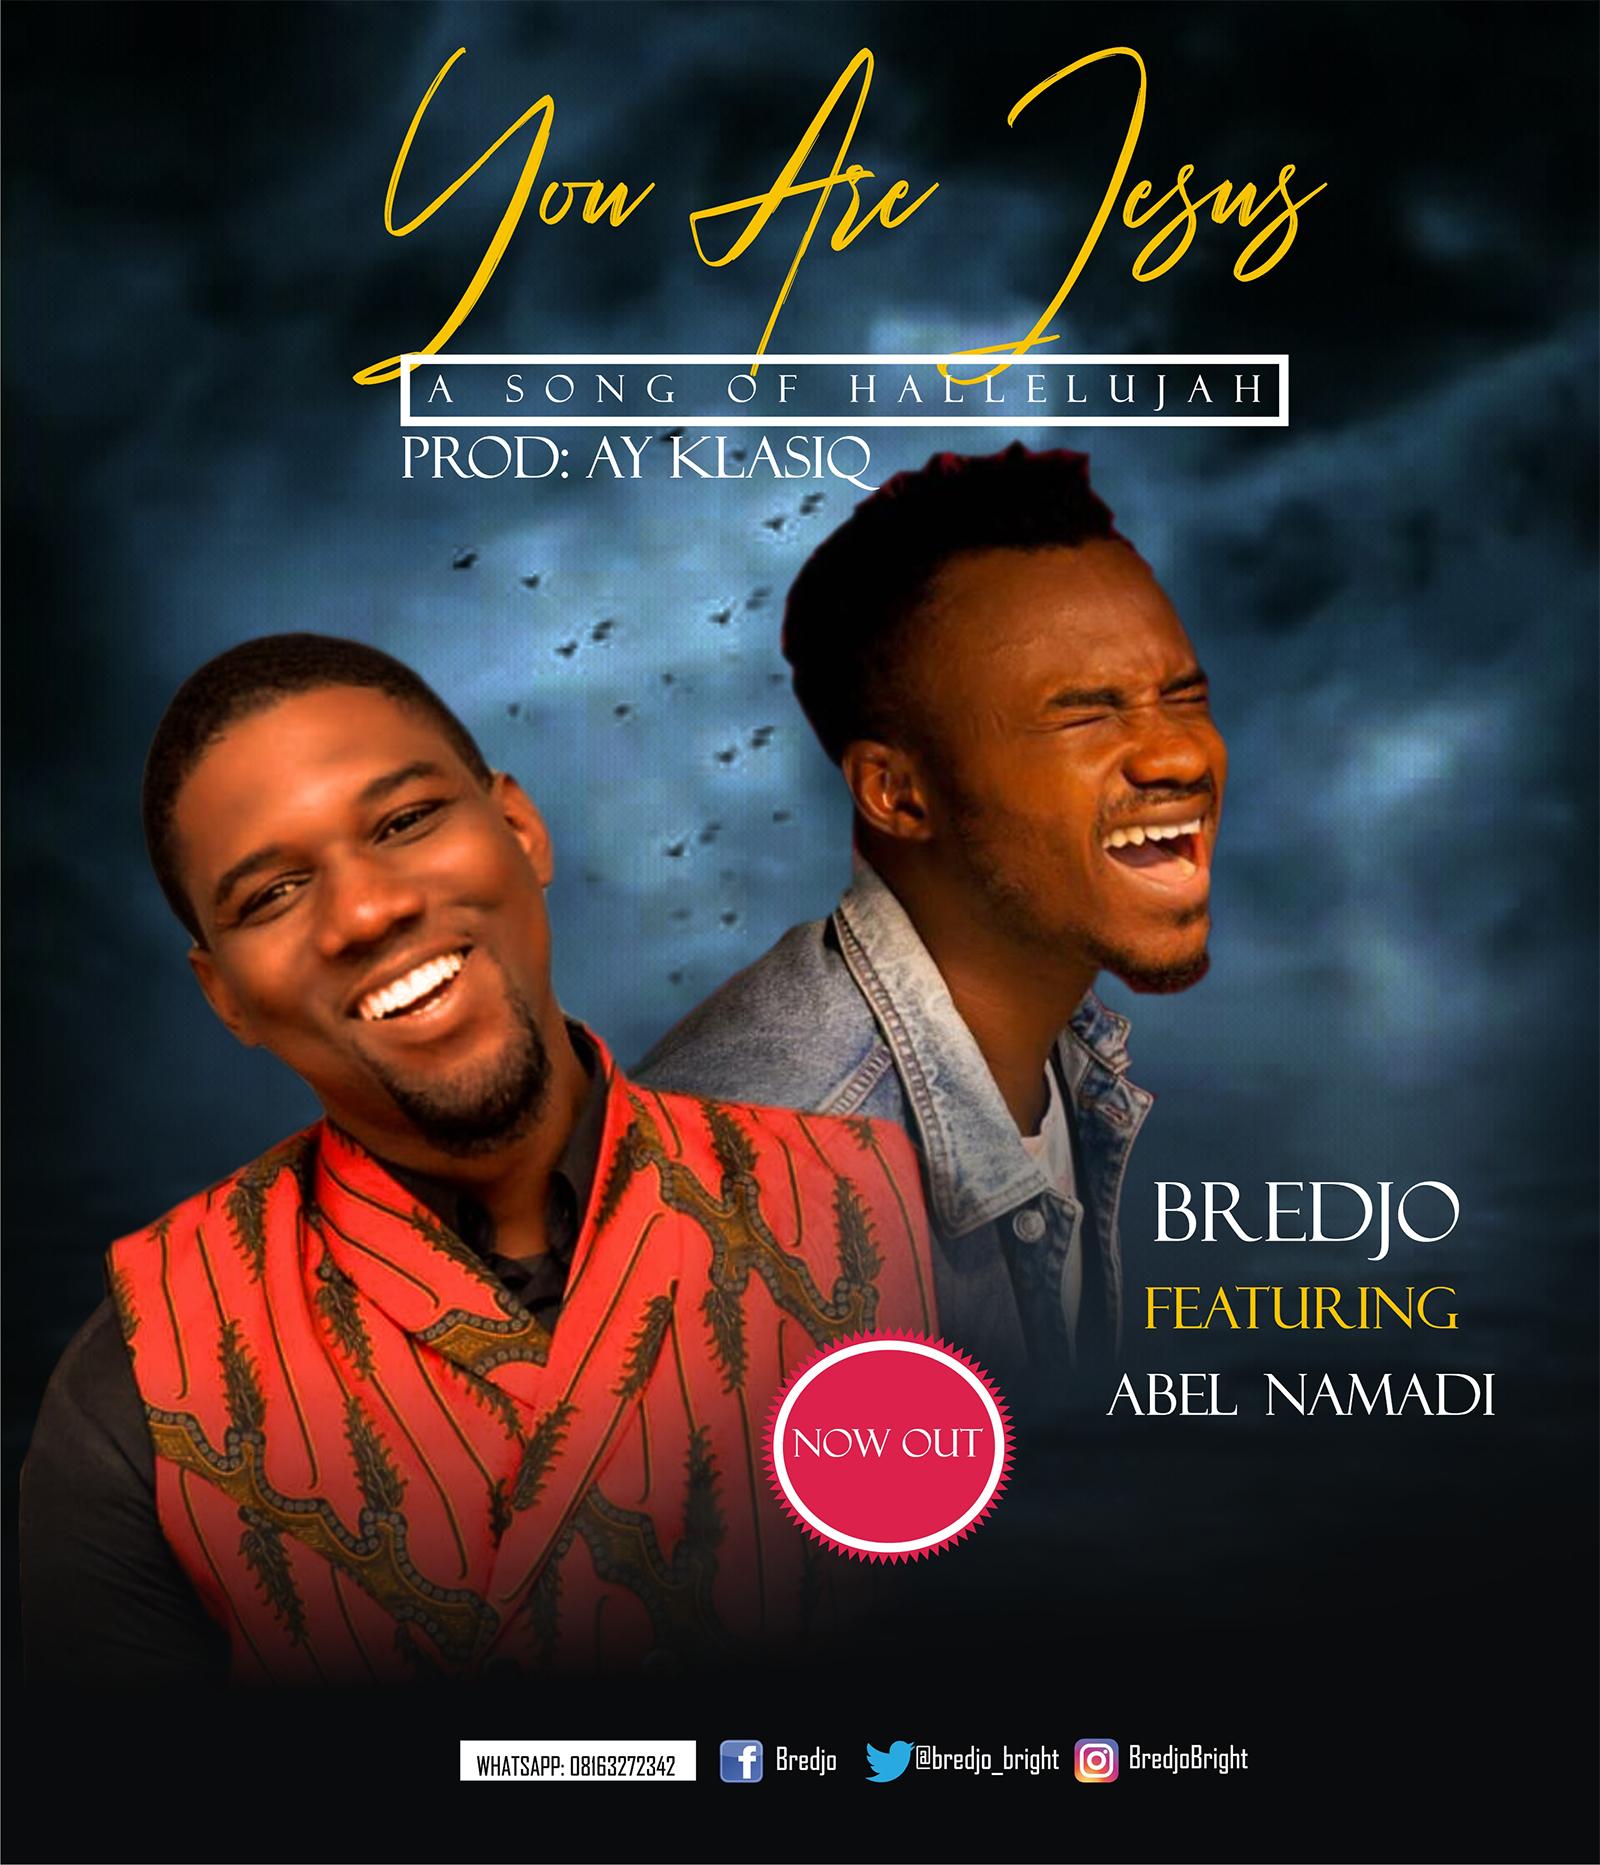 BREDJO - ''YOU ARE JESUS'' || FEAT. ABEL NAMADI || @Bredjo_bright